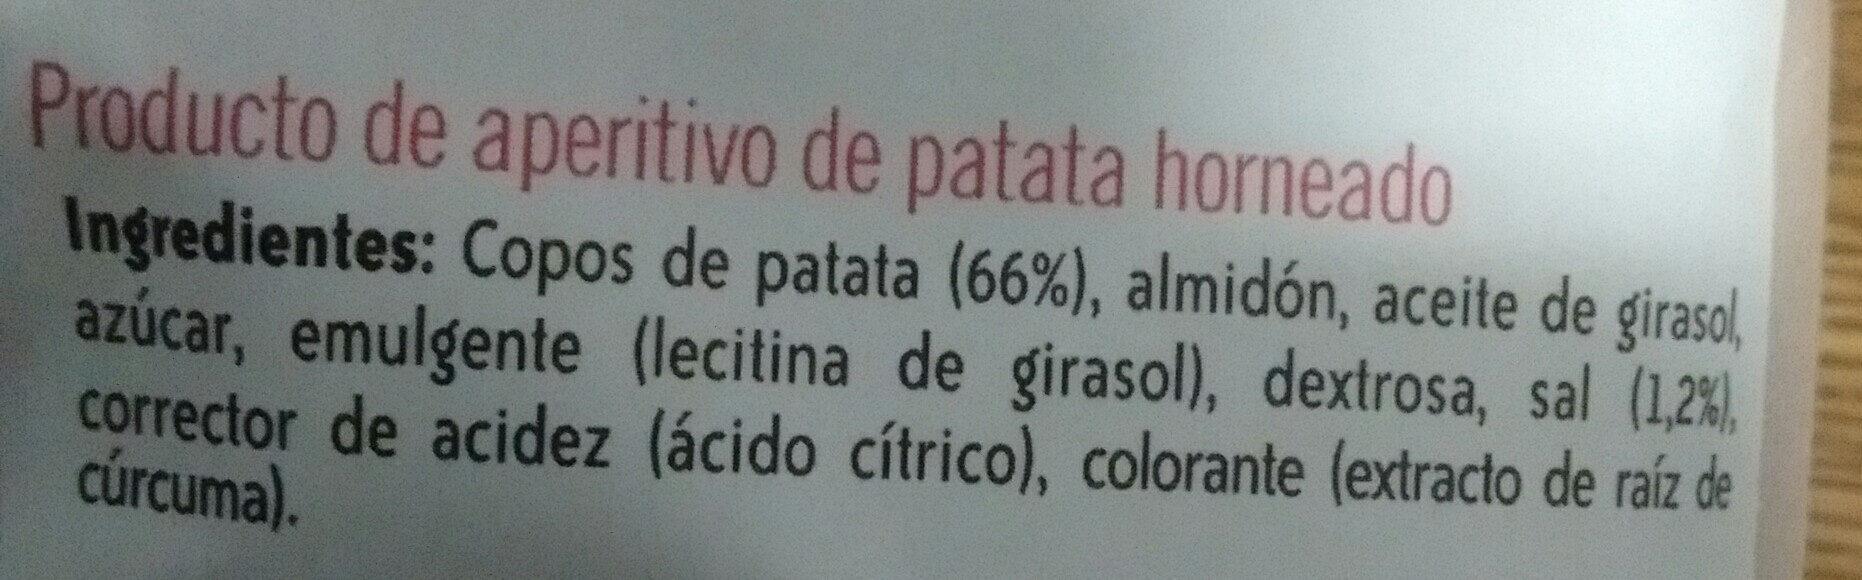 Lay's horno - Ingredients - es